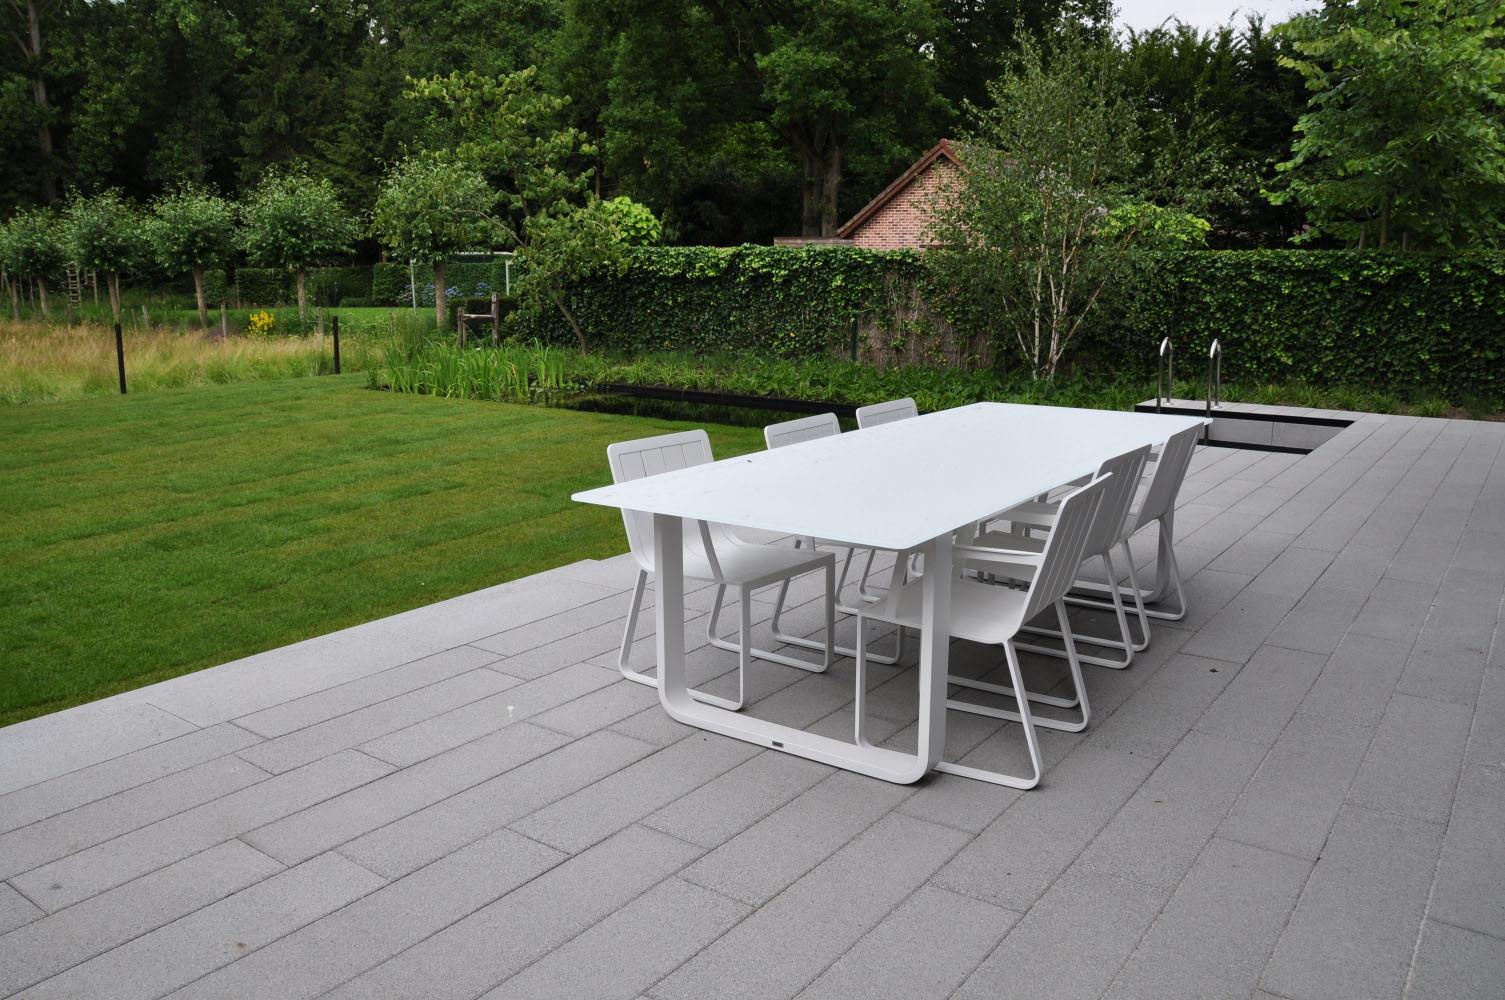 Tuin Laten Aanleggen : Moderne tuin aanleggen